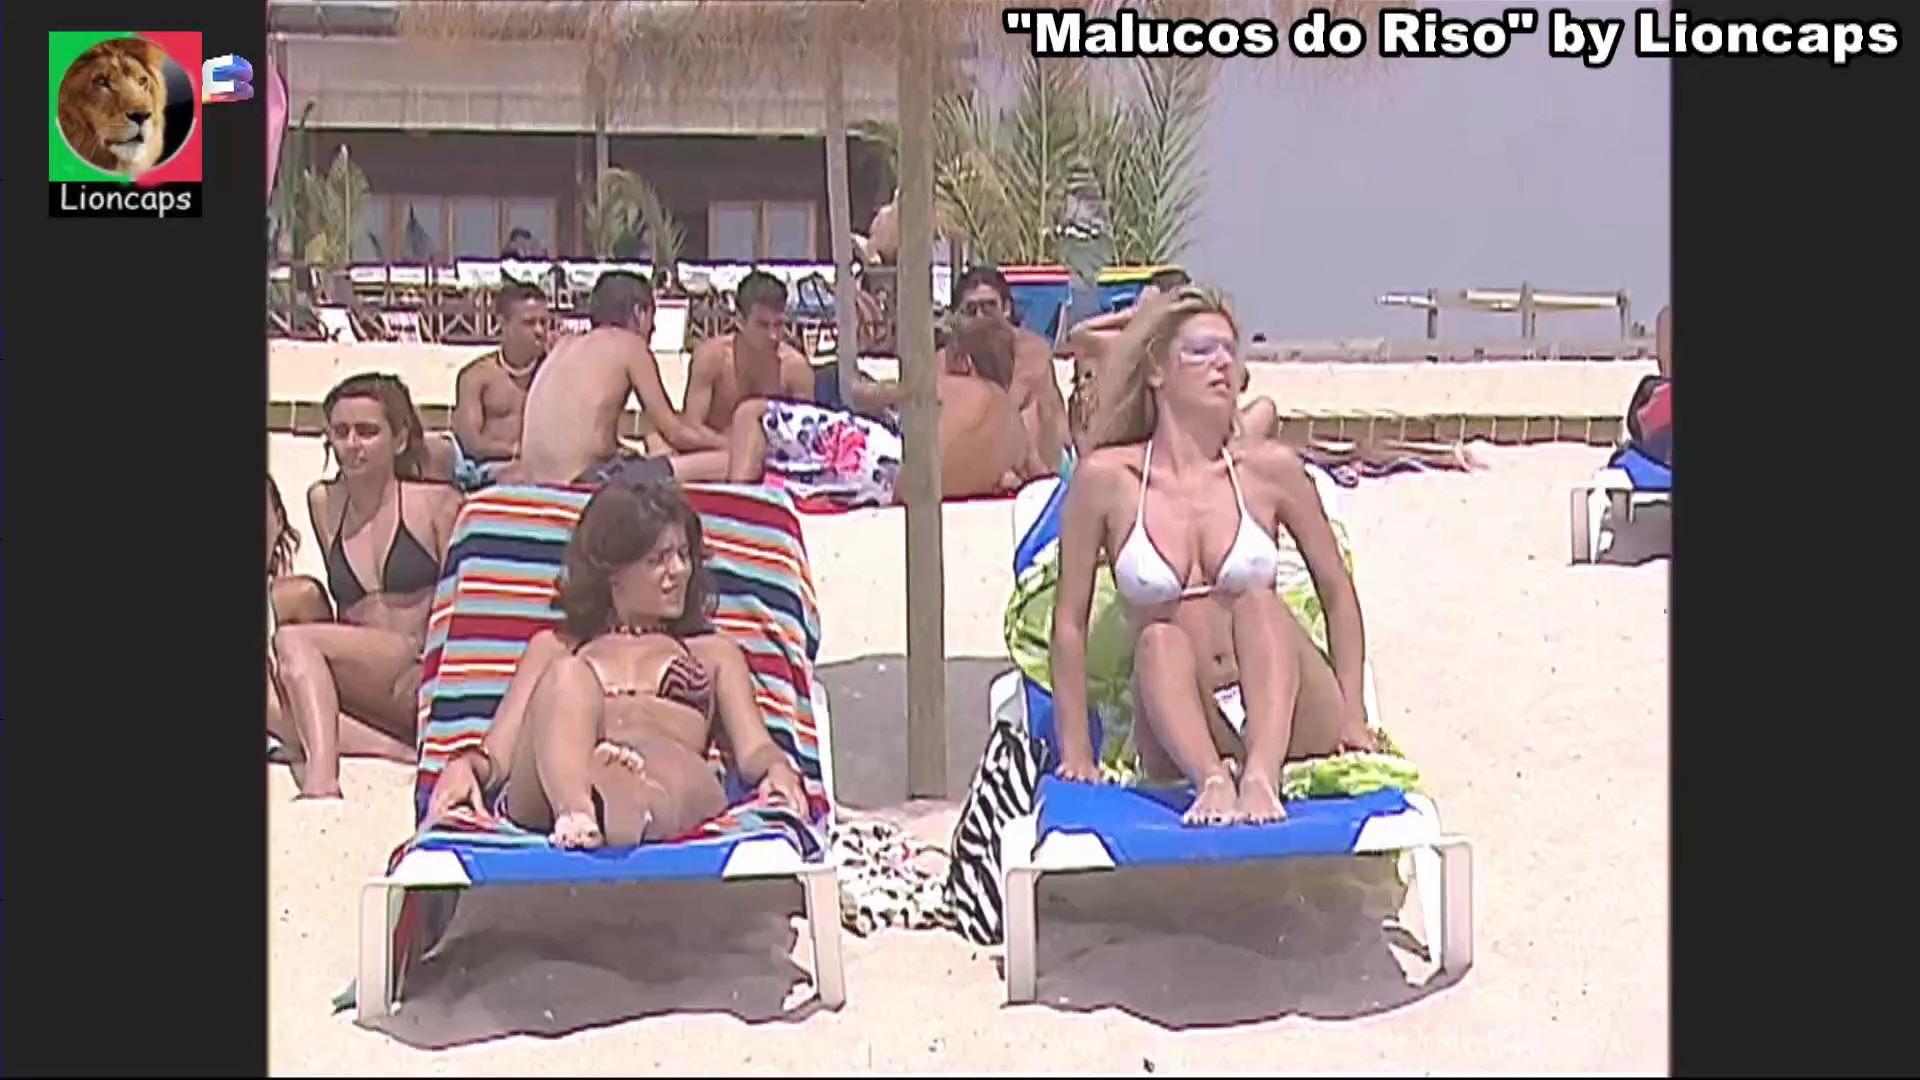 475149664_malucos_riso_alda_gomes_vs190malucos_riso_602_15061_122_39lo.JPG